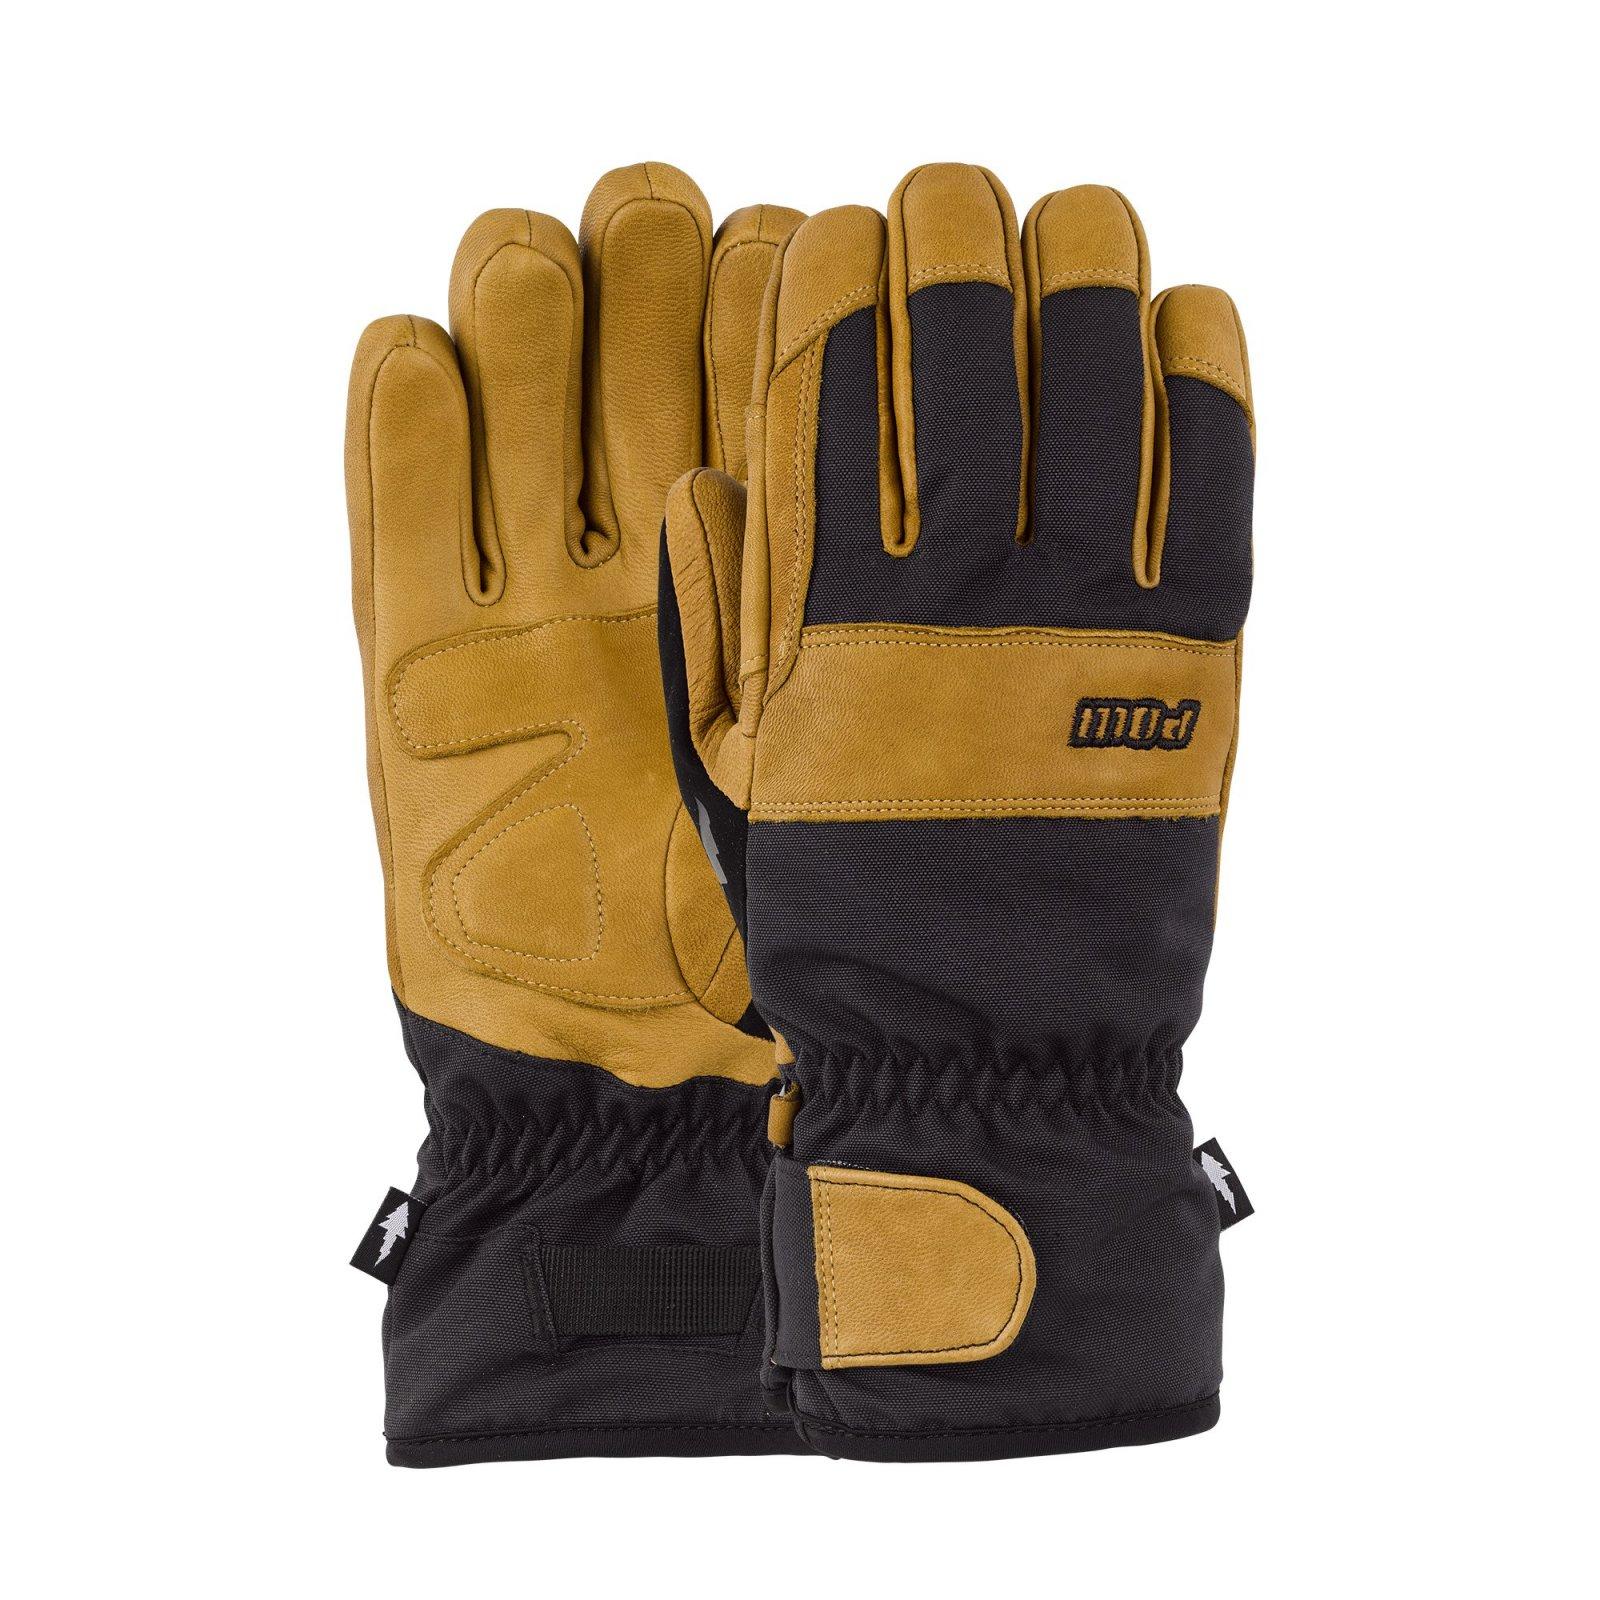 POW August Short Men's Glove 19/20